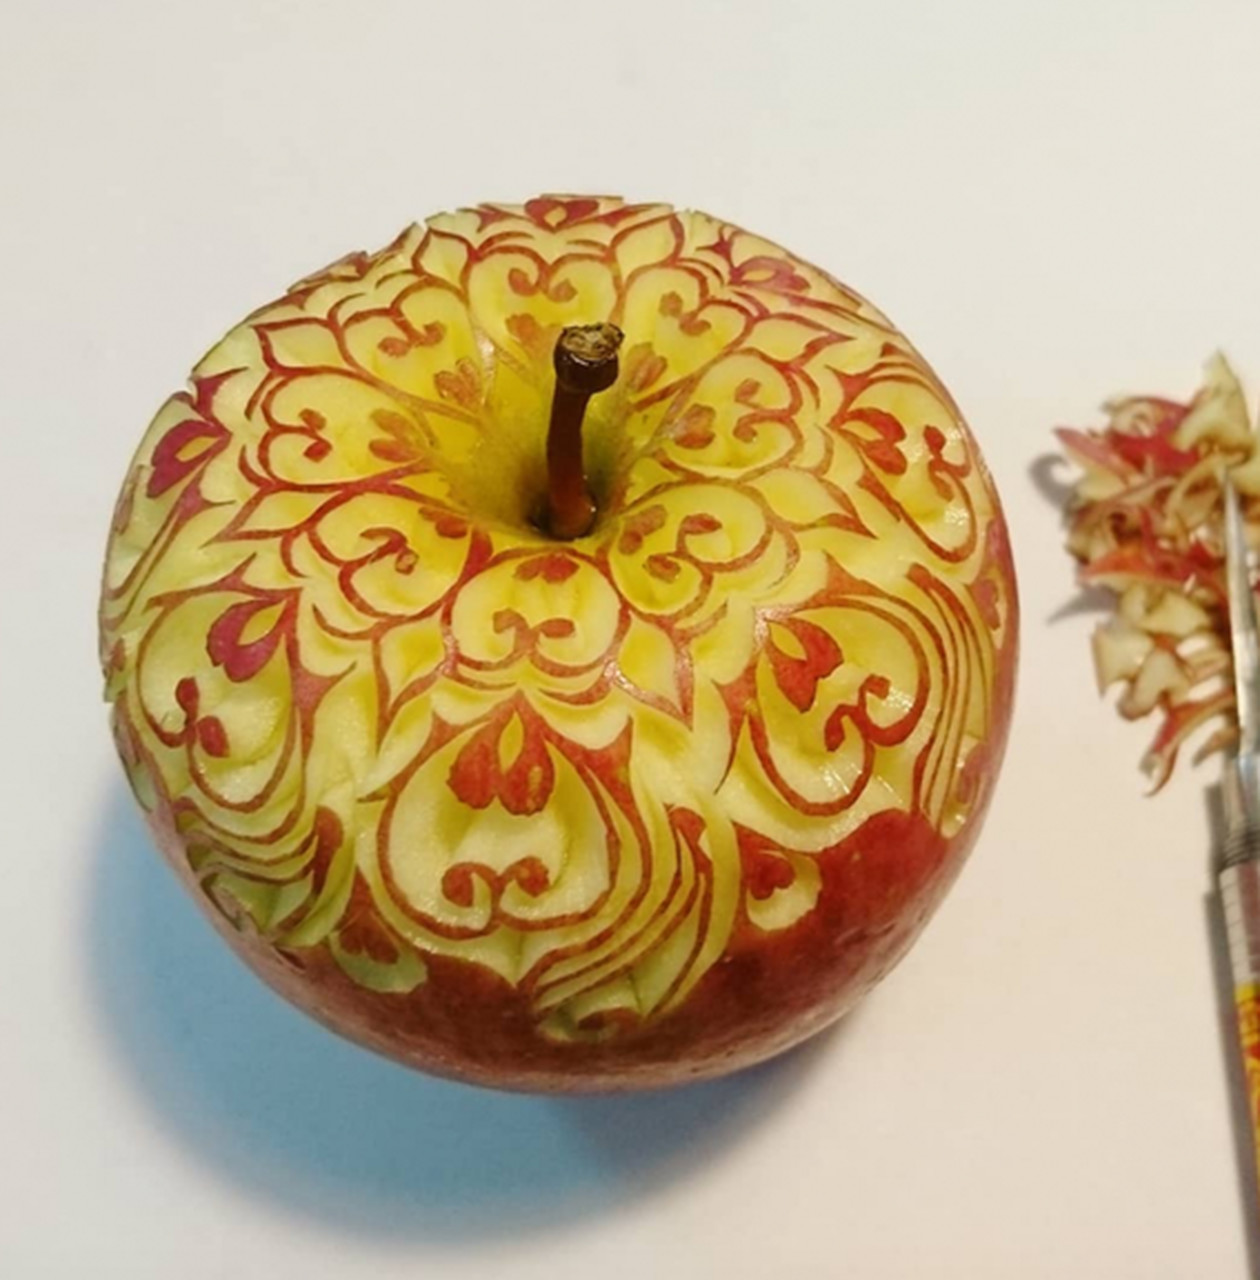 Conheça a arte de esculpir frutas